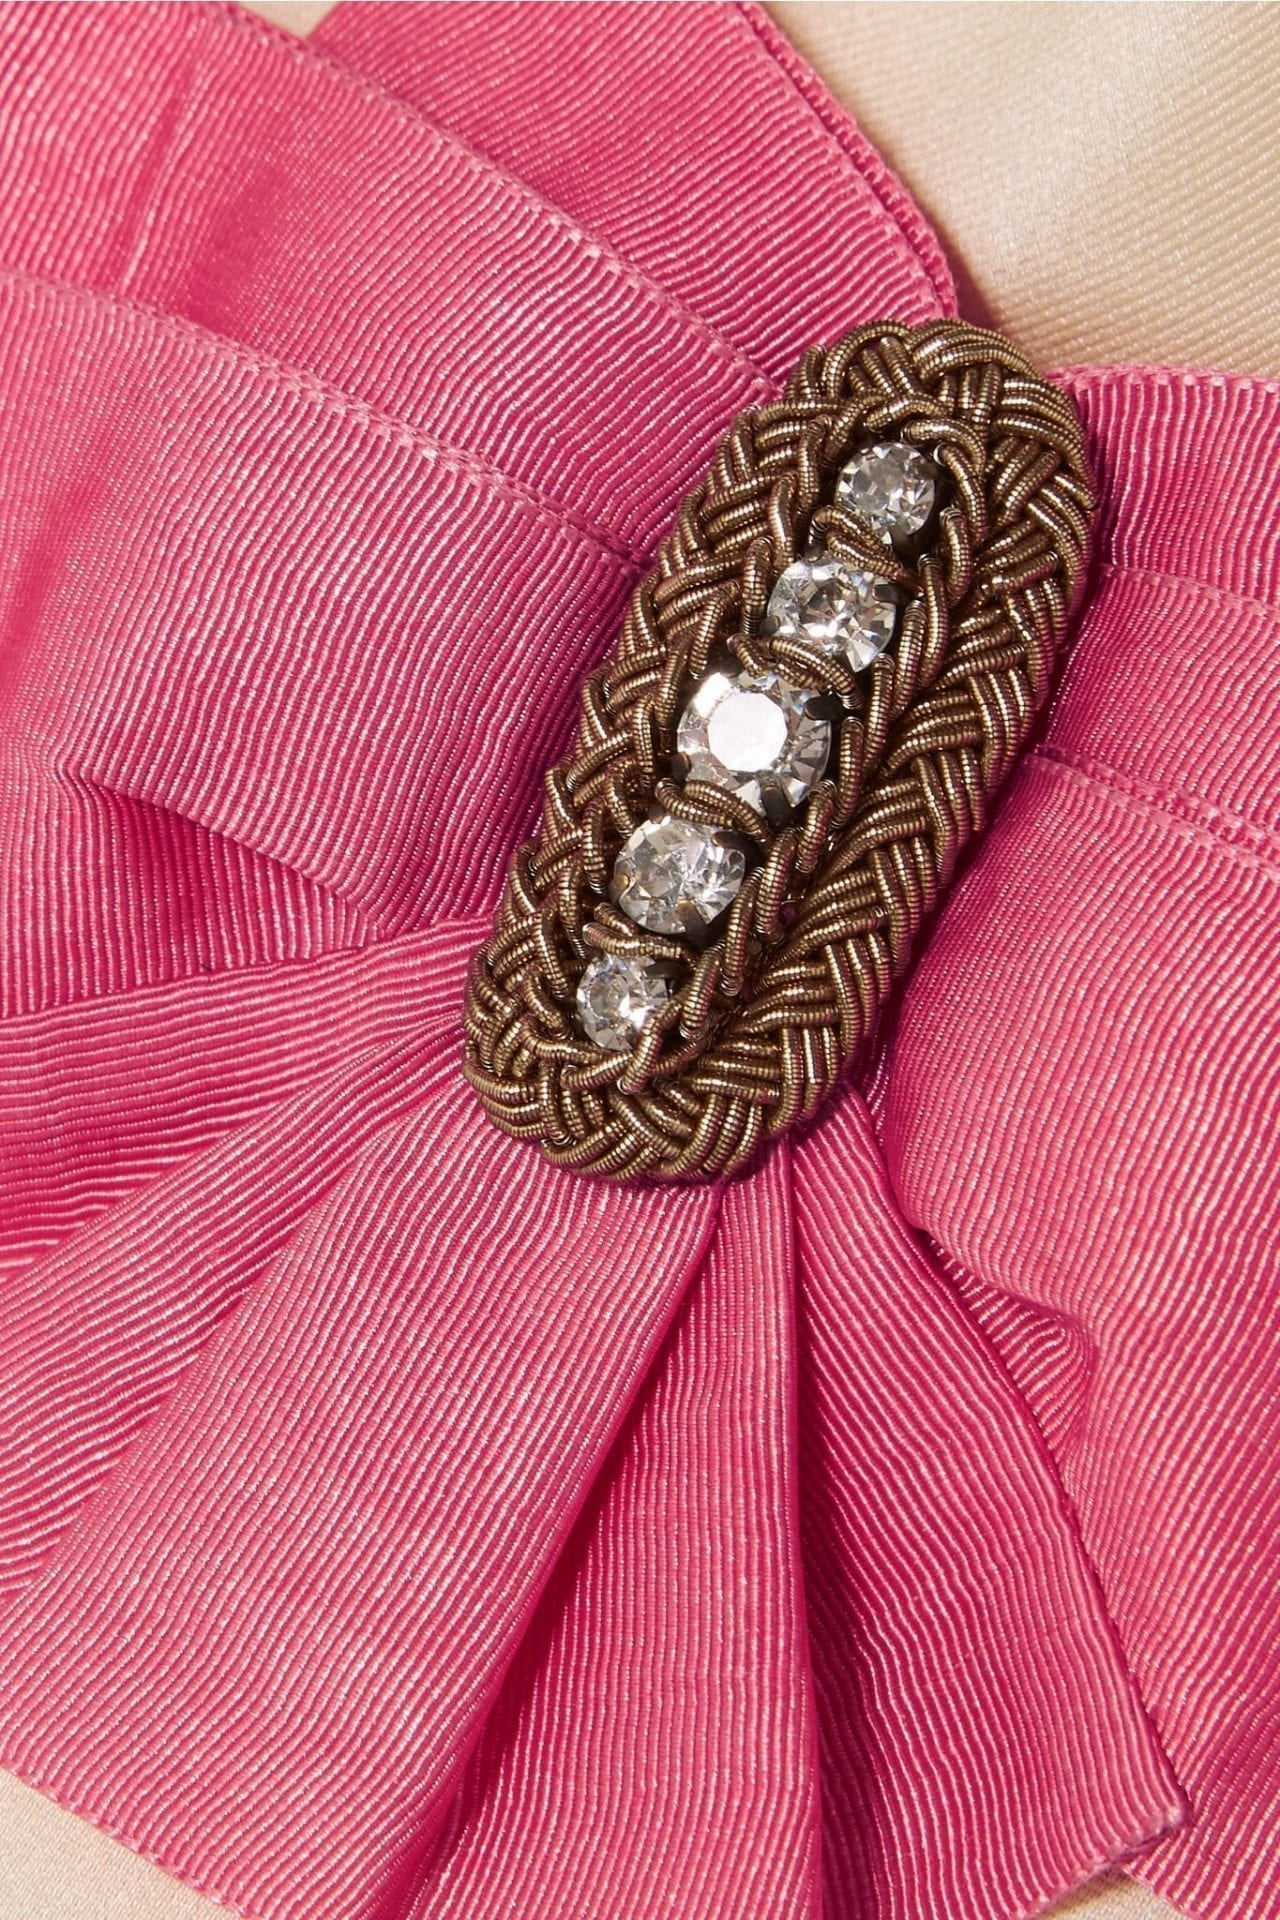 GUCCI Embellished Two-tone Silk And Devoré-velvet Mini Dress